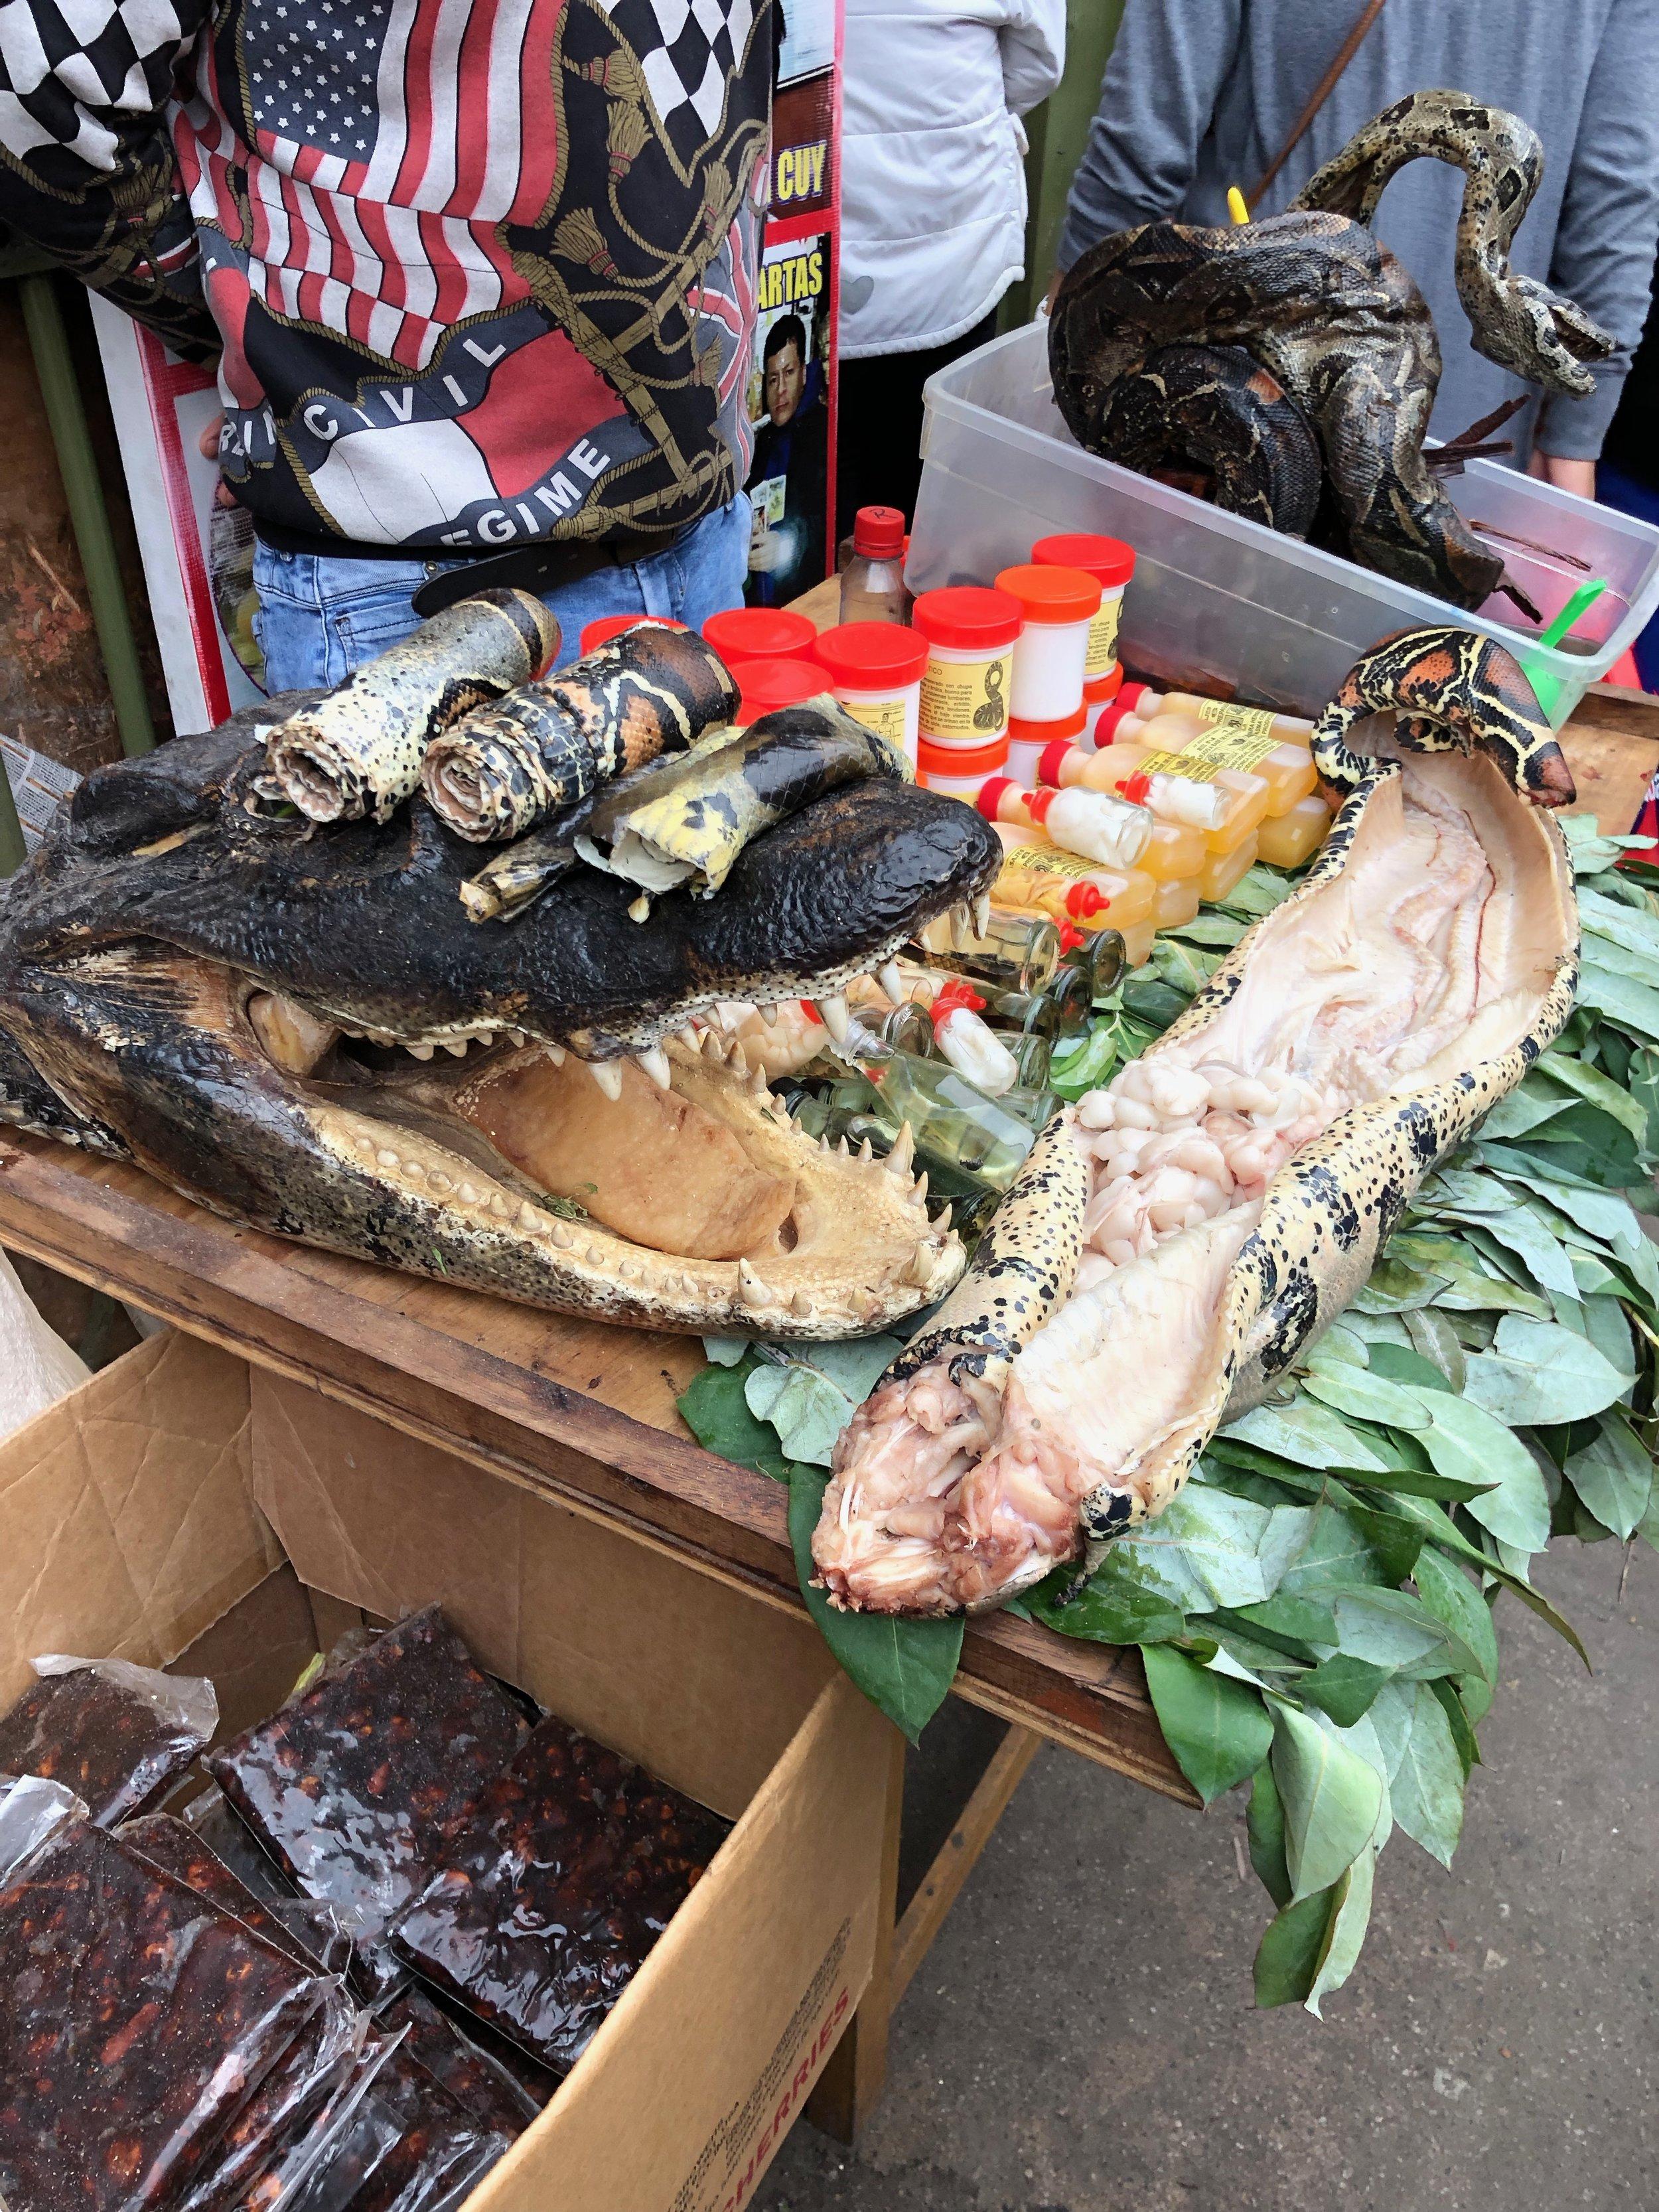 Mercado de Brujas (Witches' Market)